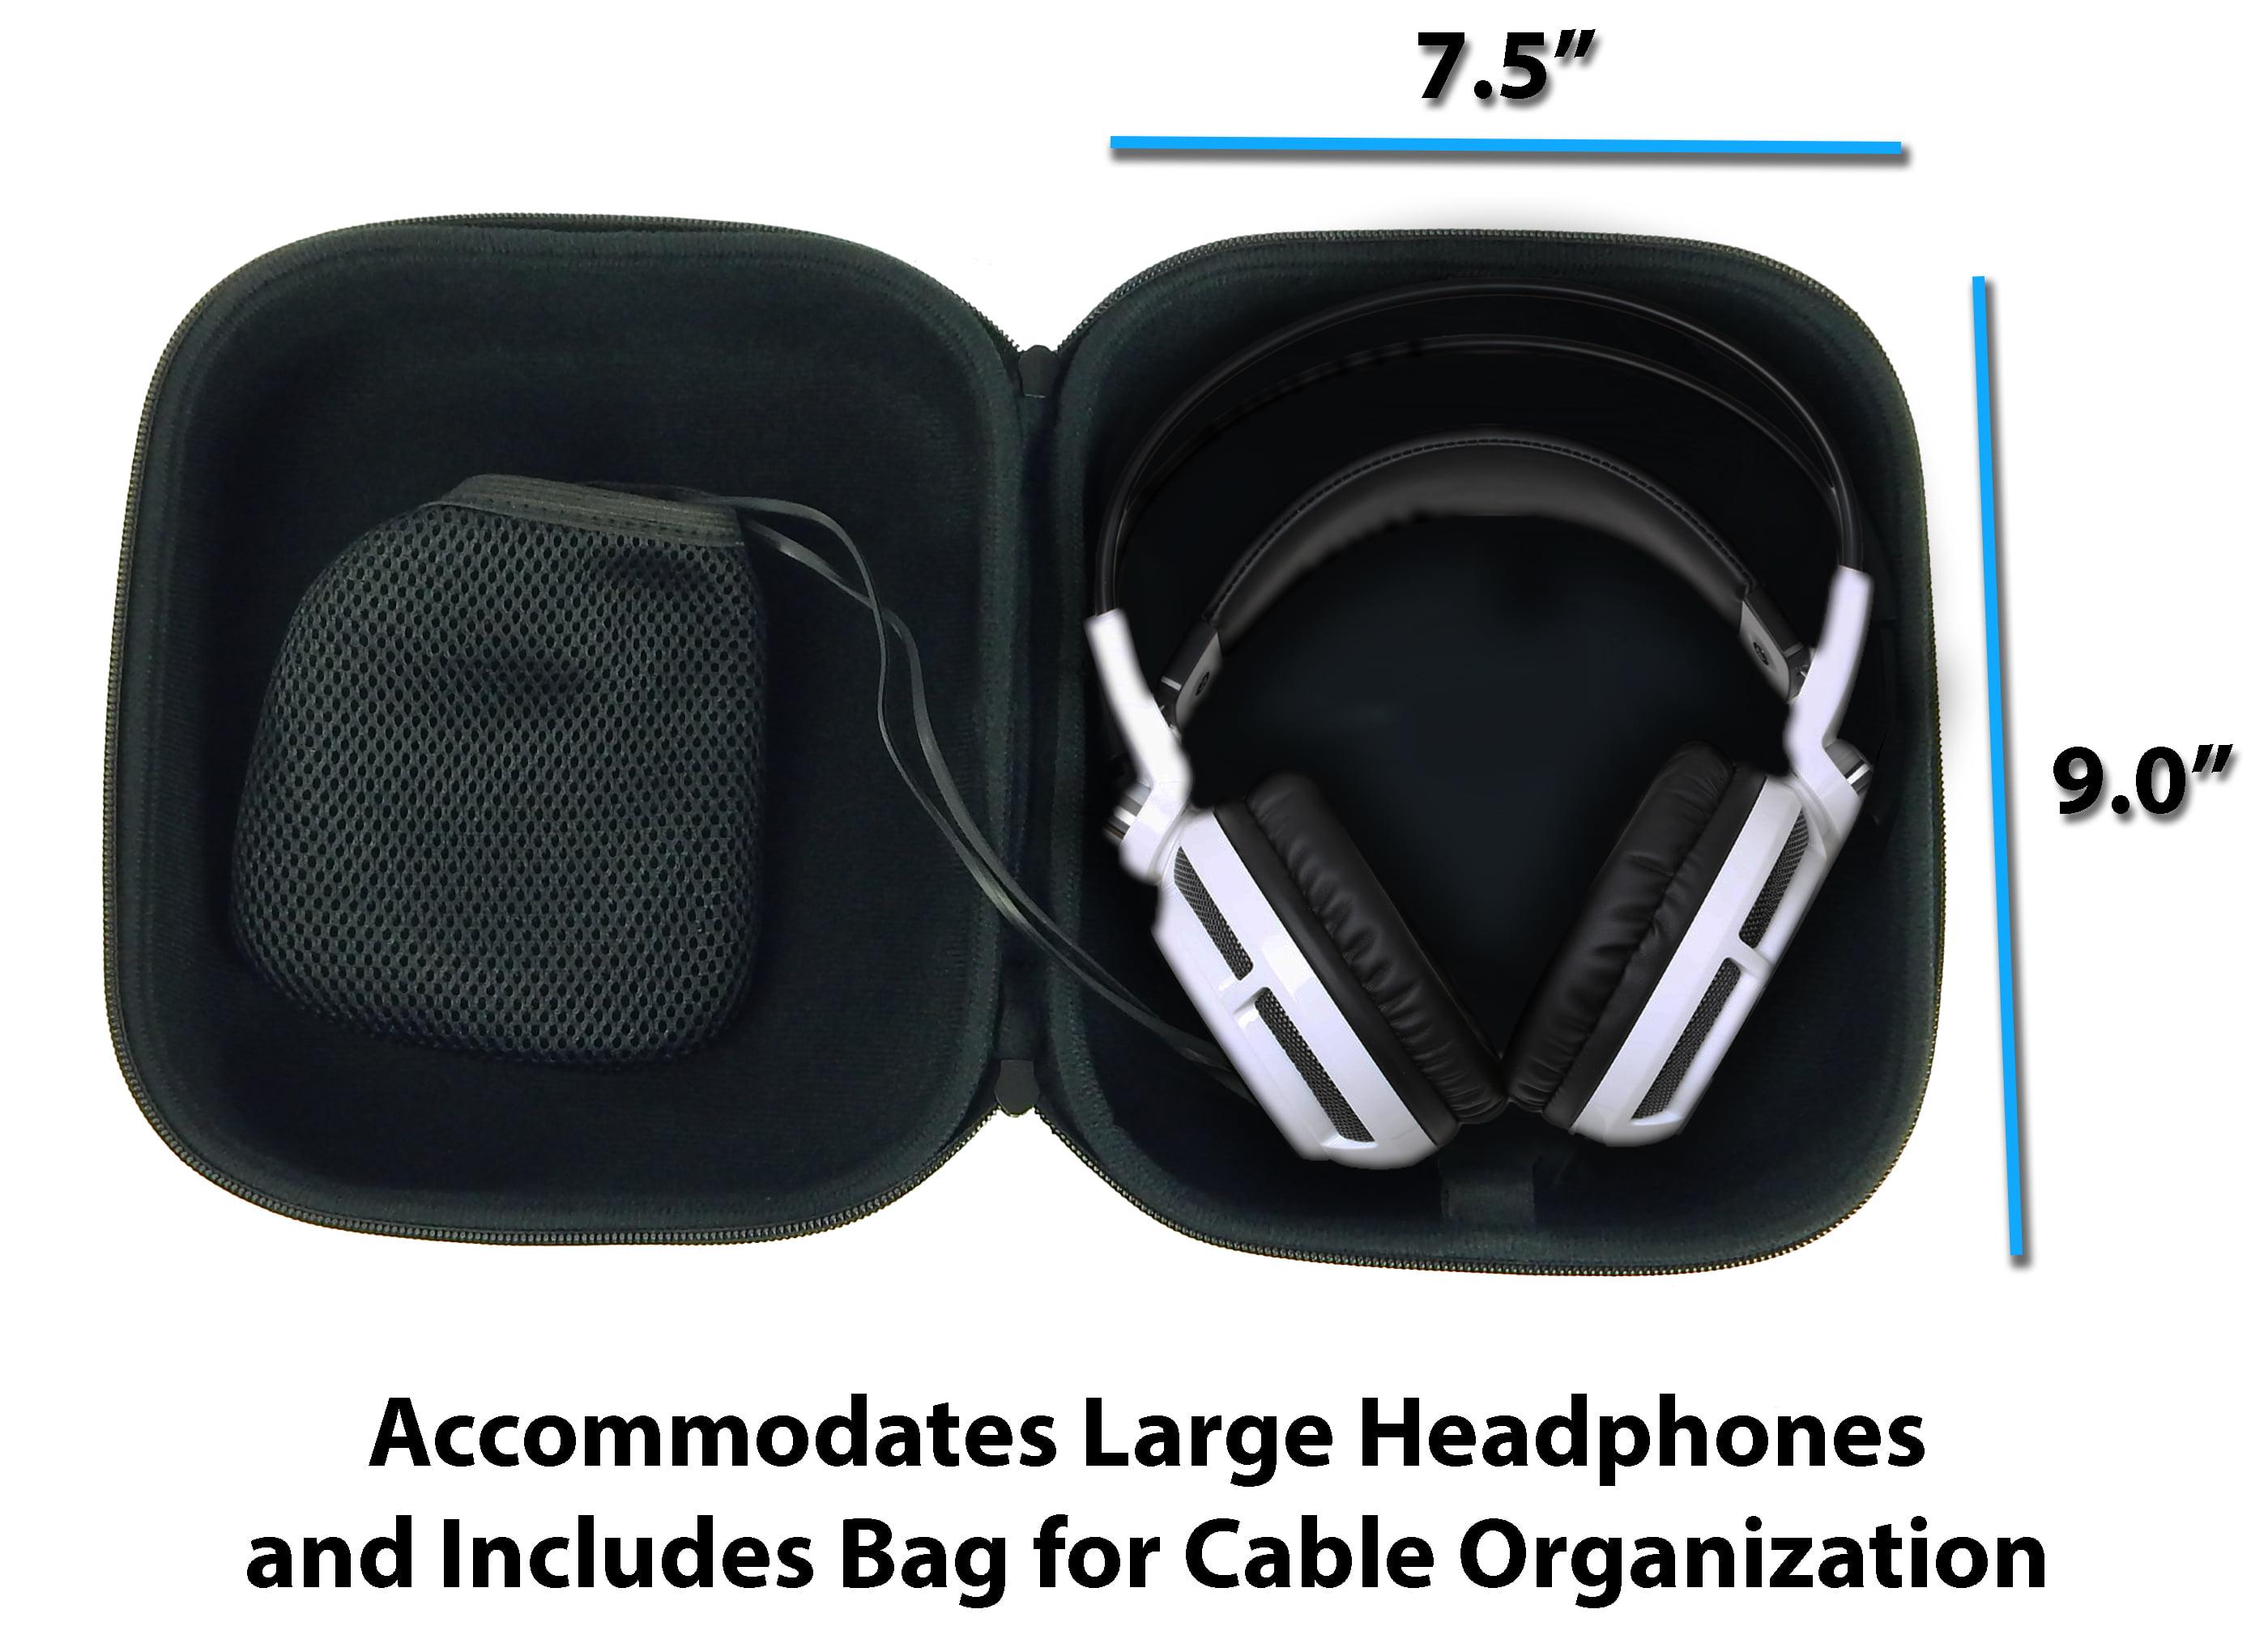 3c4e4b97b7e CASEMATIX Protective Gaming Headset Travel Case Bag – Fits SteelSeries  Siberia 350 , Siberia 800 , 650 , Siberia V3 Prism , Raw Prism , Siberia 200  ...